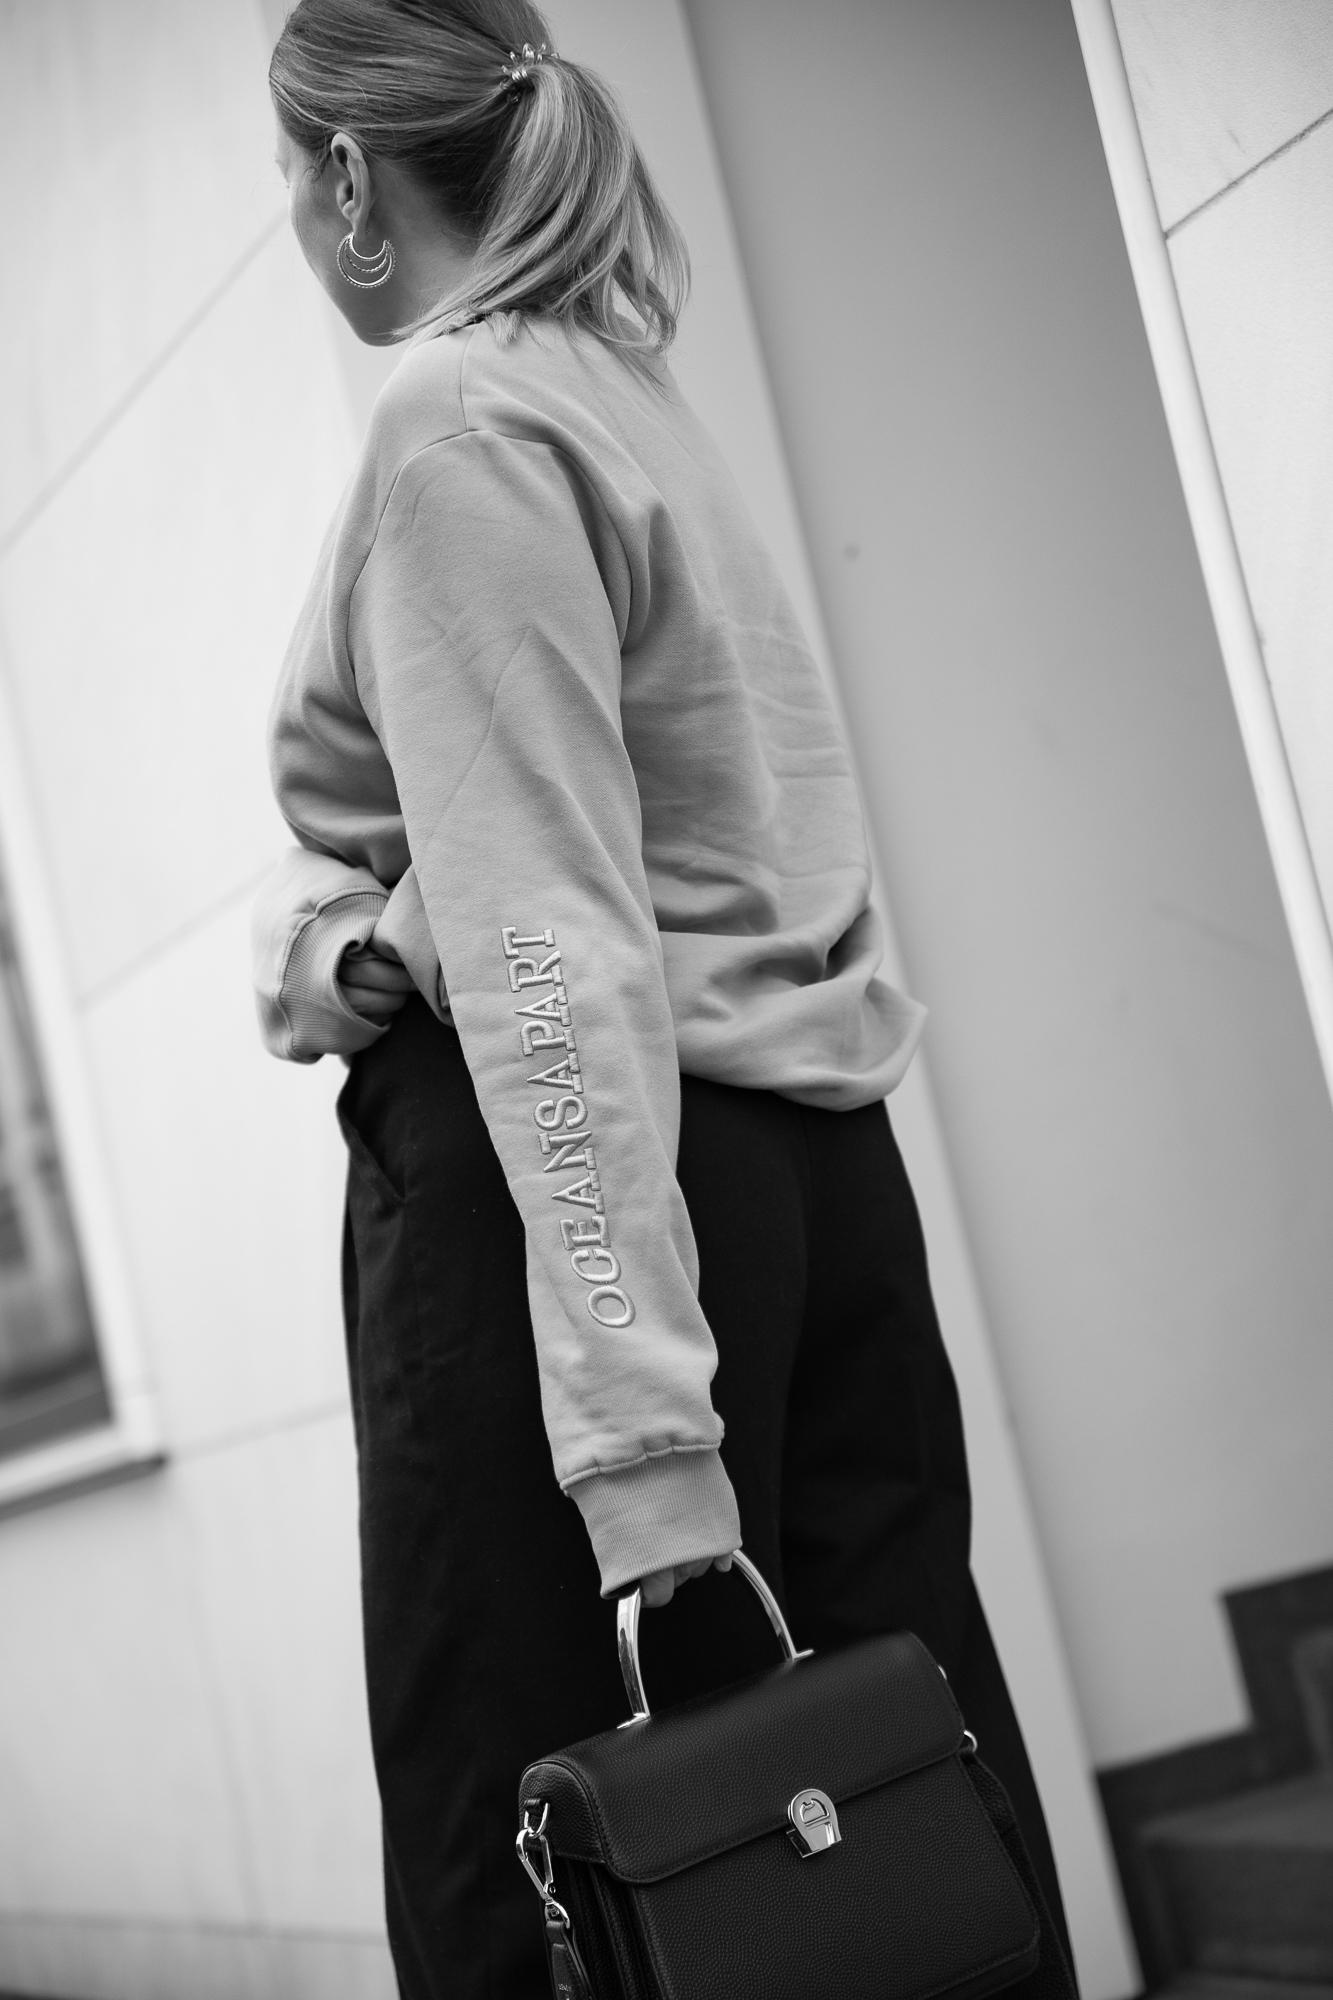 athleisure-outfits-sweater-oceansapart-oversize-sweatshirt-aline-kaplan-modeblog-berlin